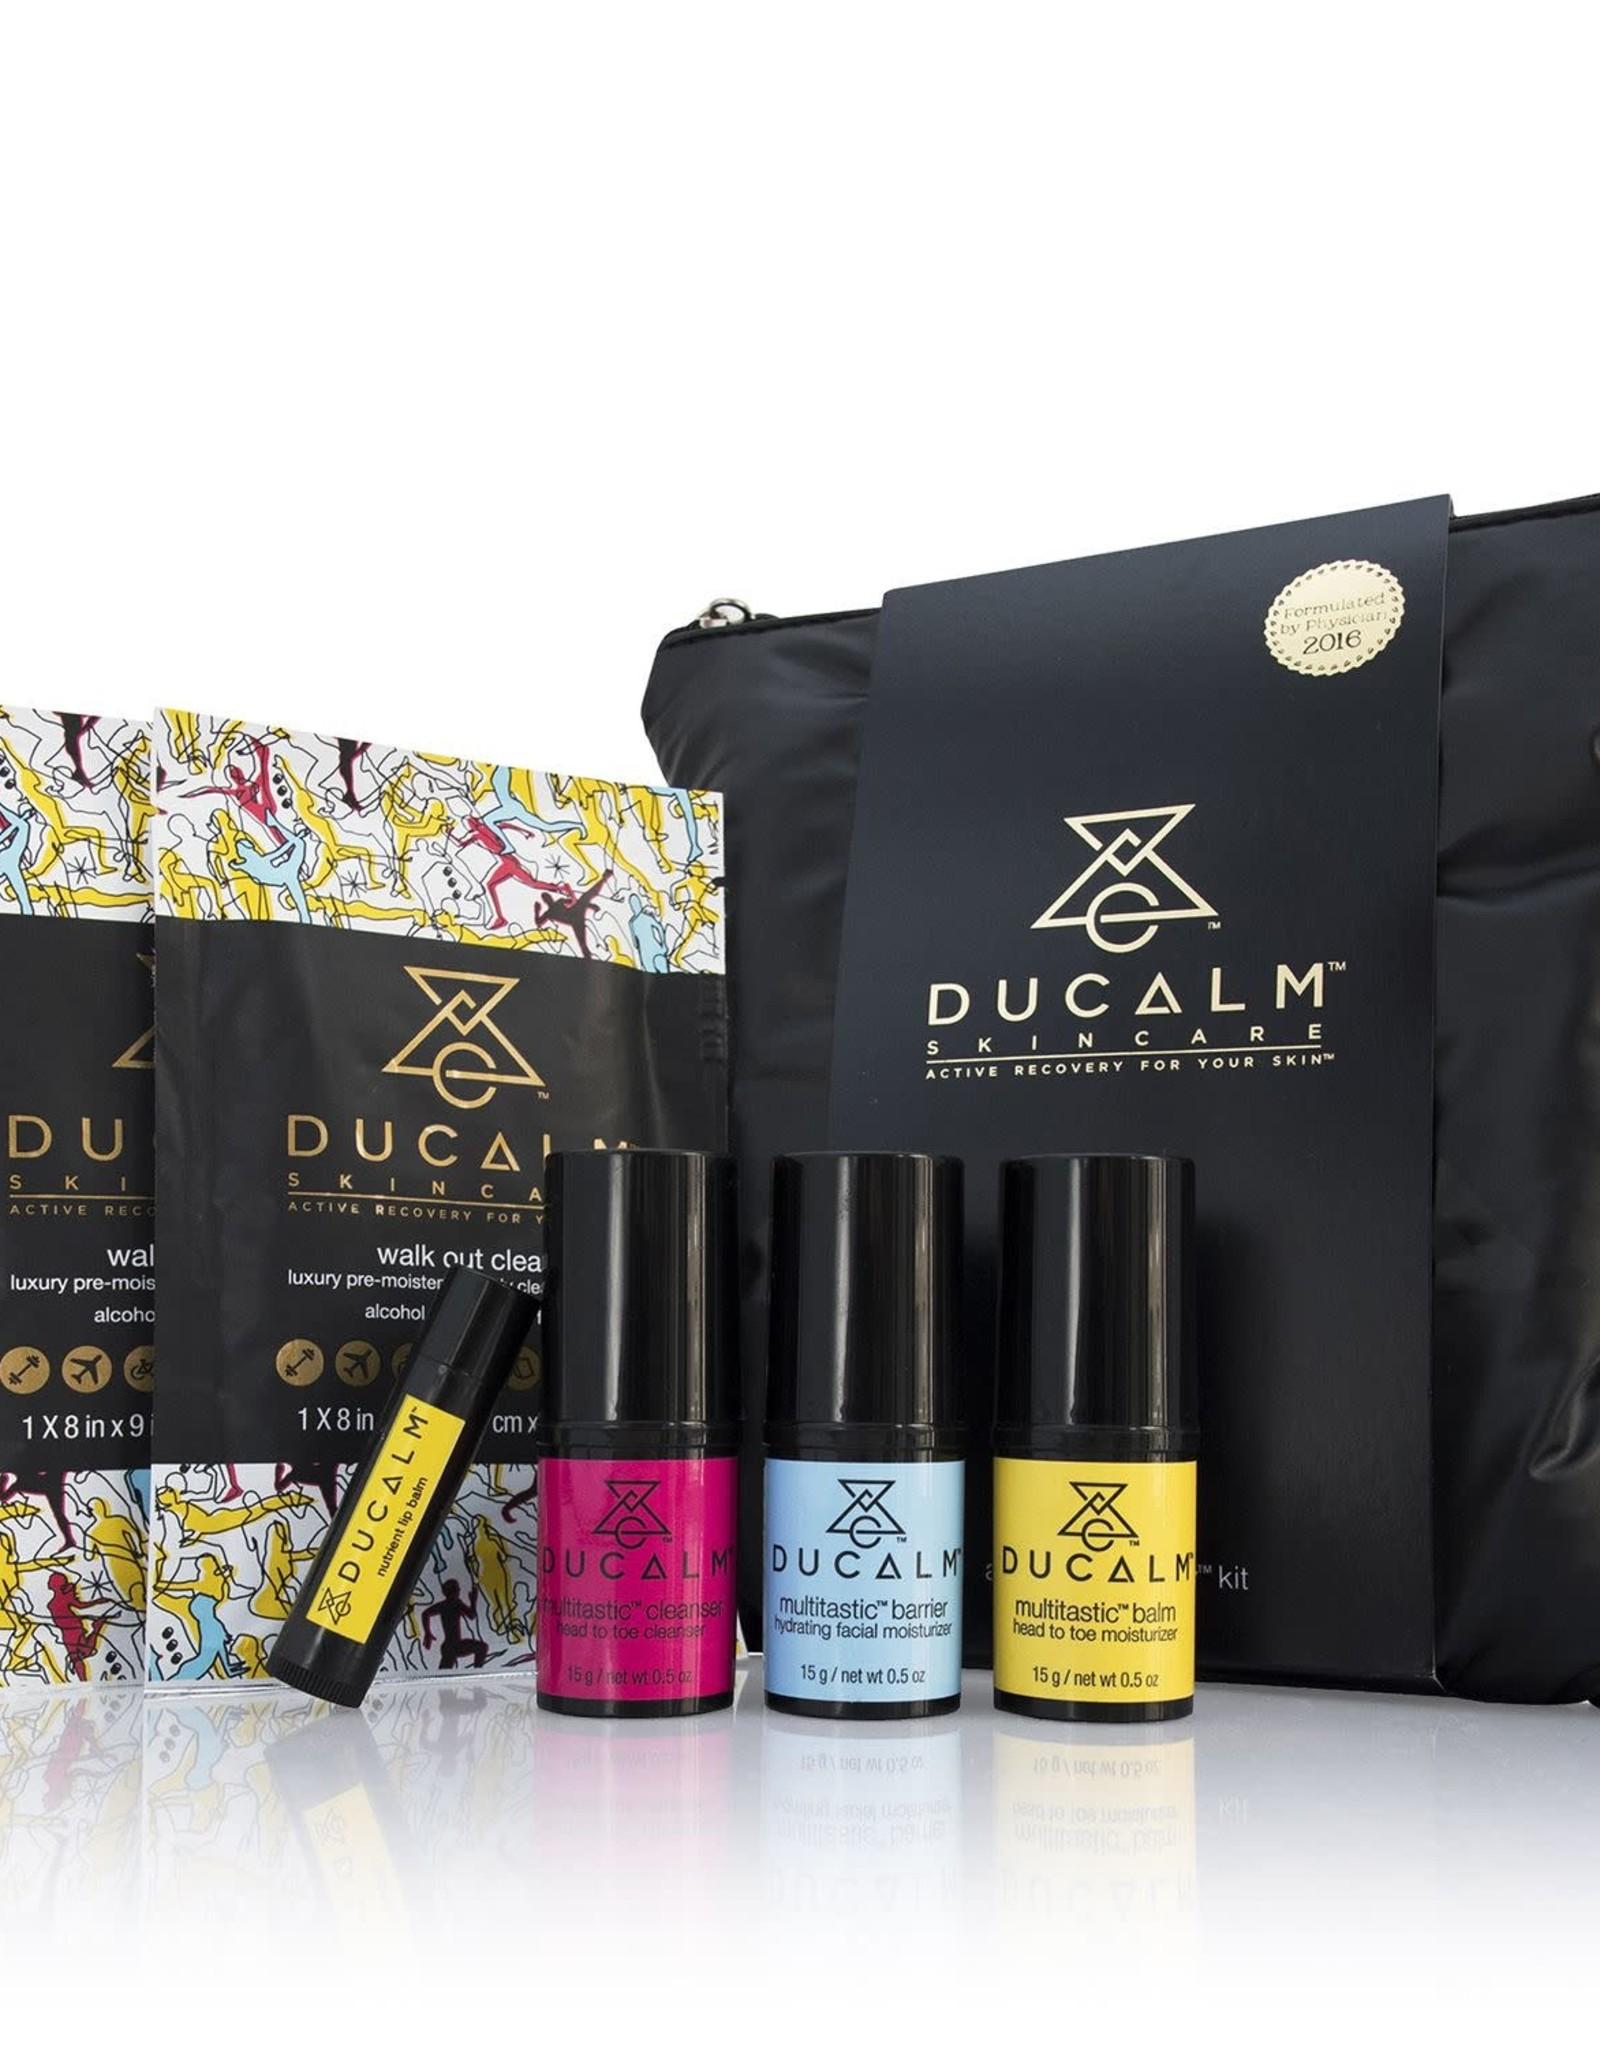 Ducalm Ducalm Recovery Kit